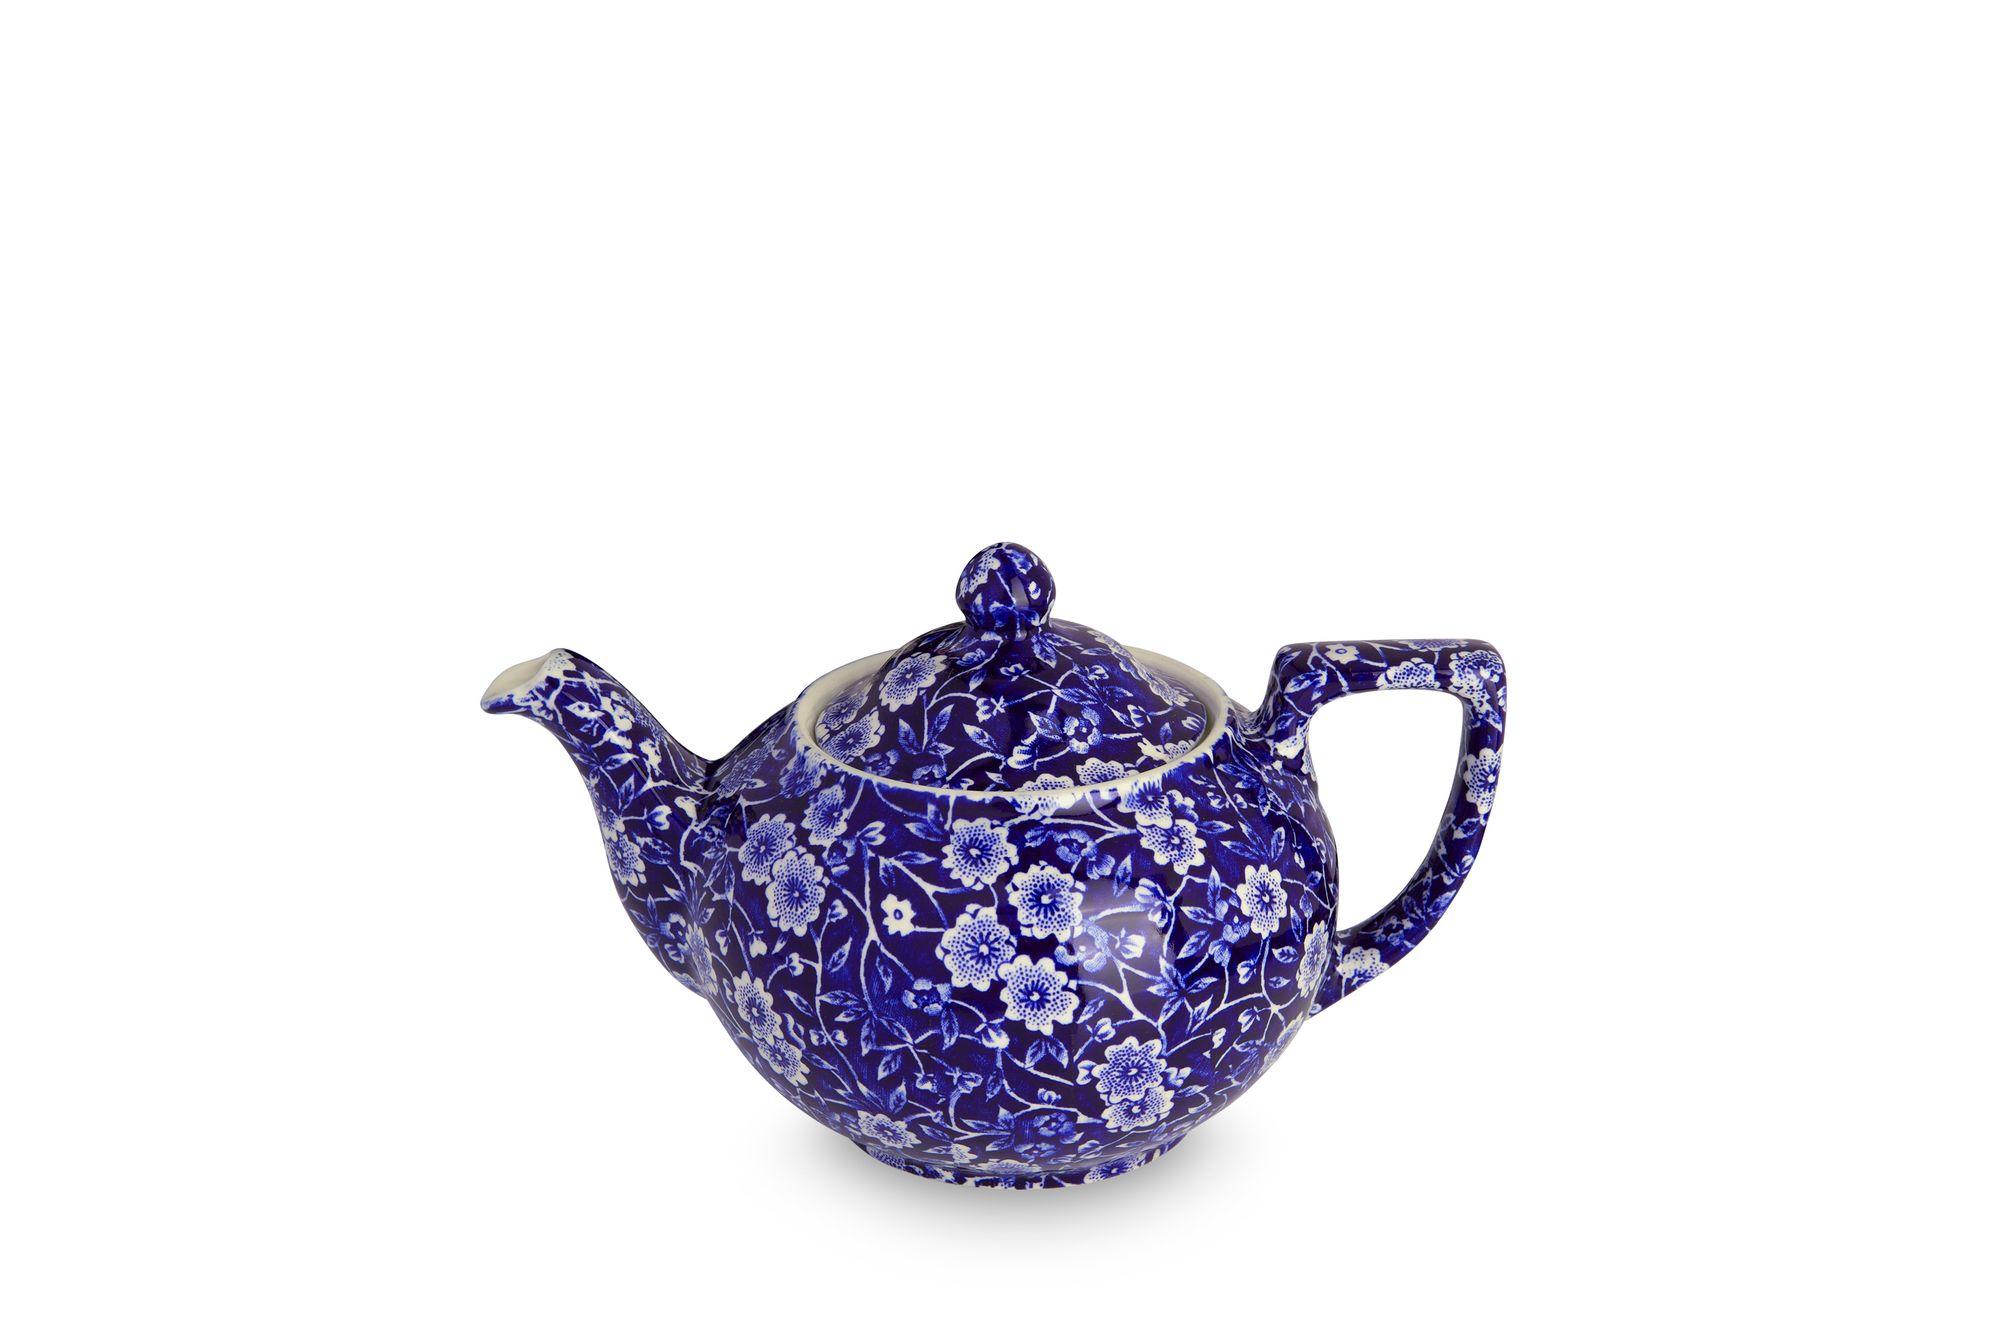 Burleigh Blue Calico Teapot 1pt thumb 2